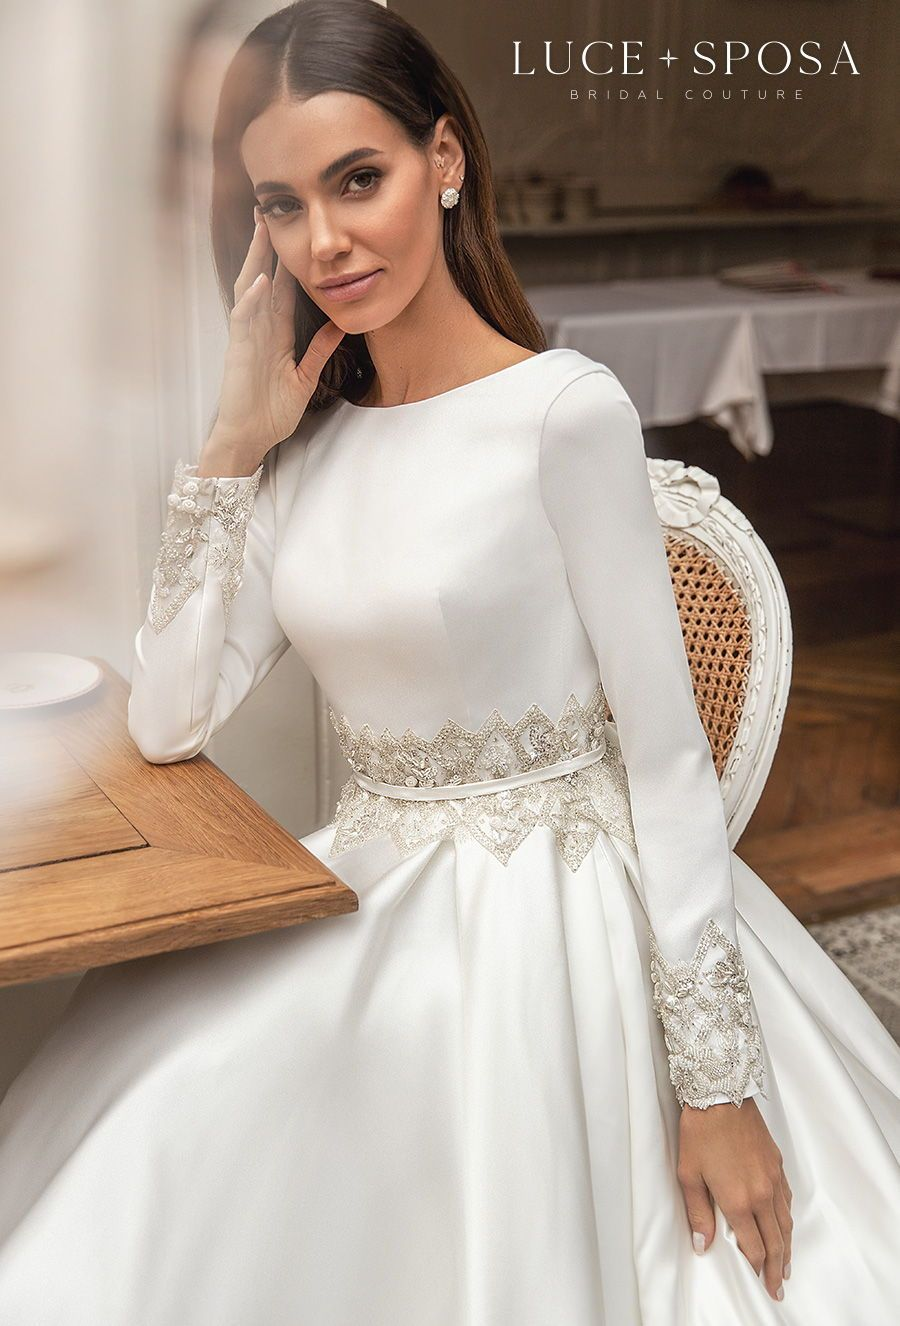 Luce Sposa Spring Summer 2021 Wedding Dresses Istanbul Paris Bridal Collections Wedding Inspirasi Stylish Wedding Dresses Wedding Dress Long Sleeve Wedding Dress Sleeves [ 1326 x 900 Pixel ]